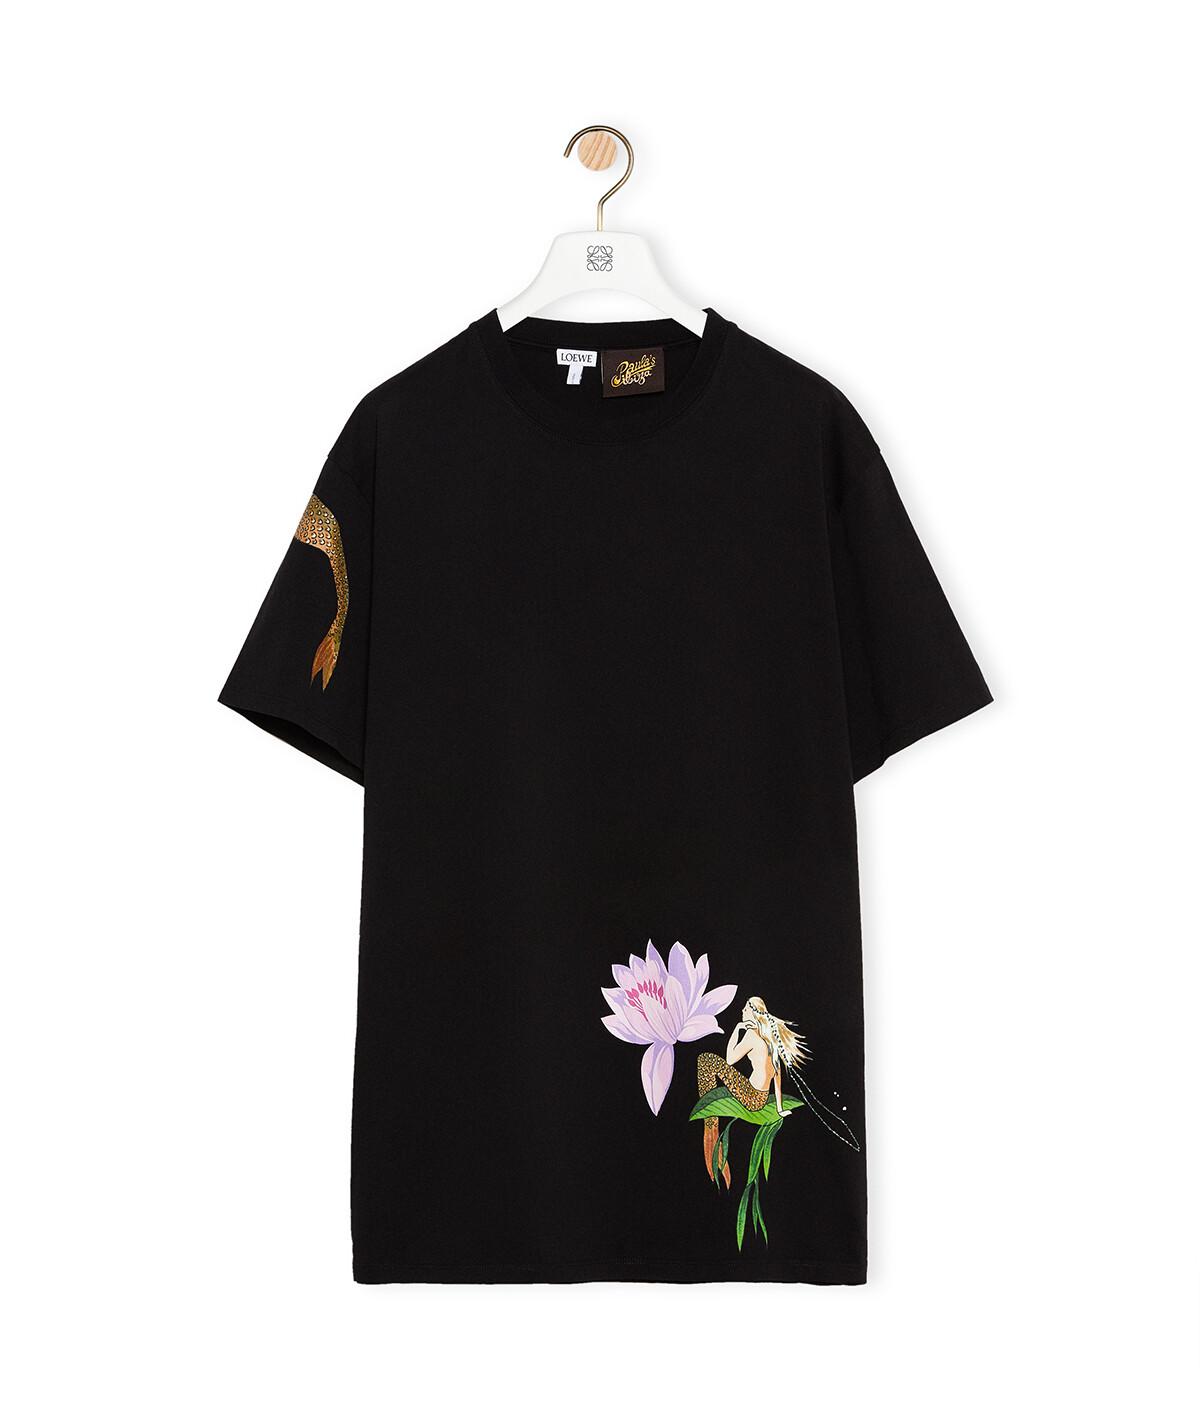 LOEWE T-Shirt In Mermaid Cotton Black front